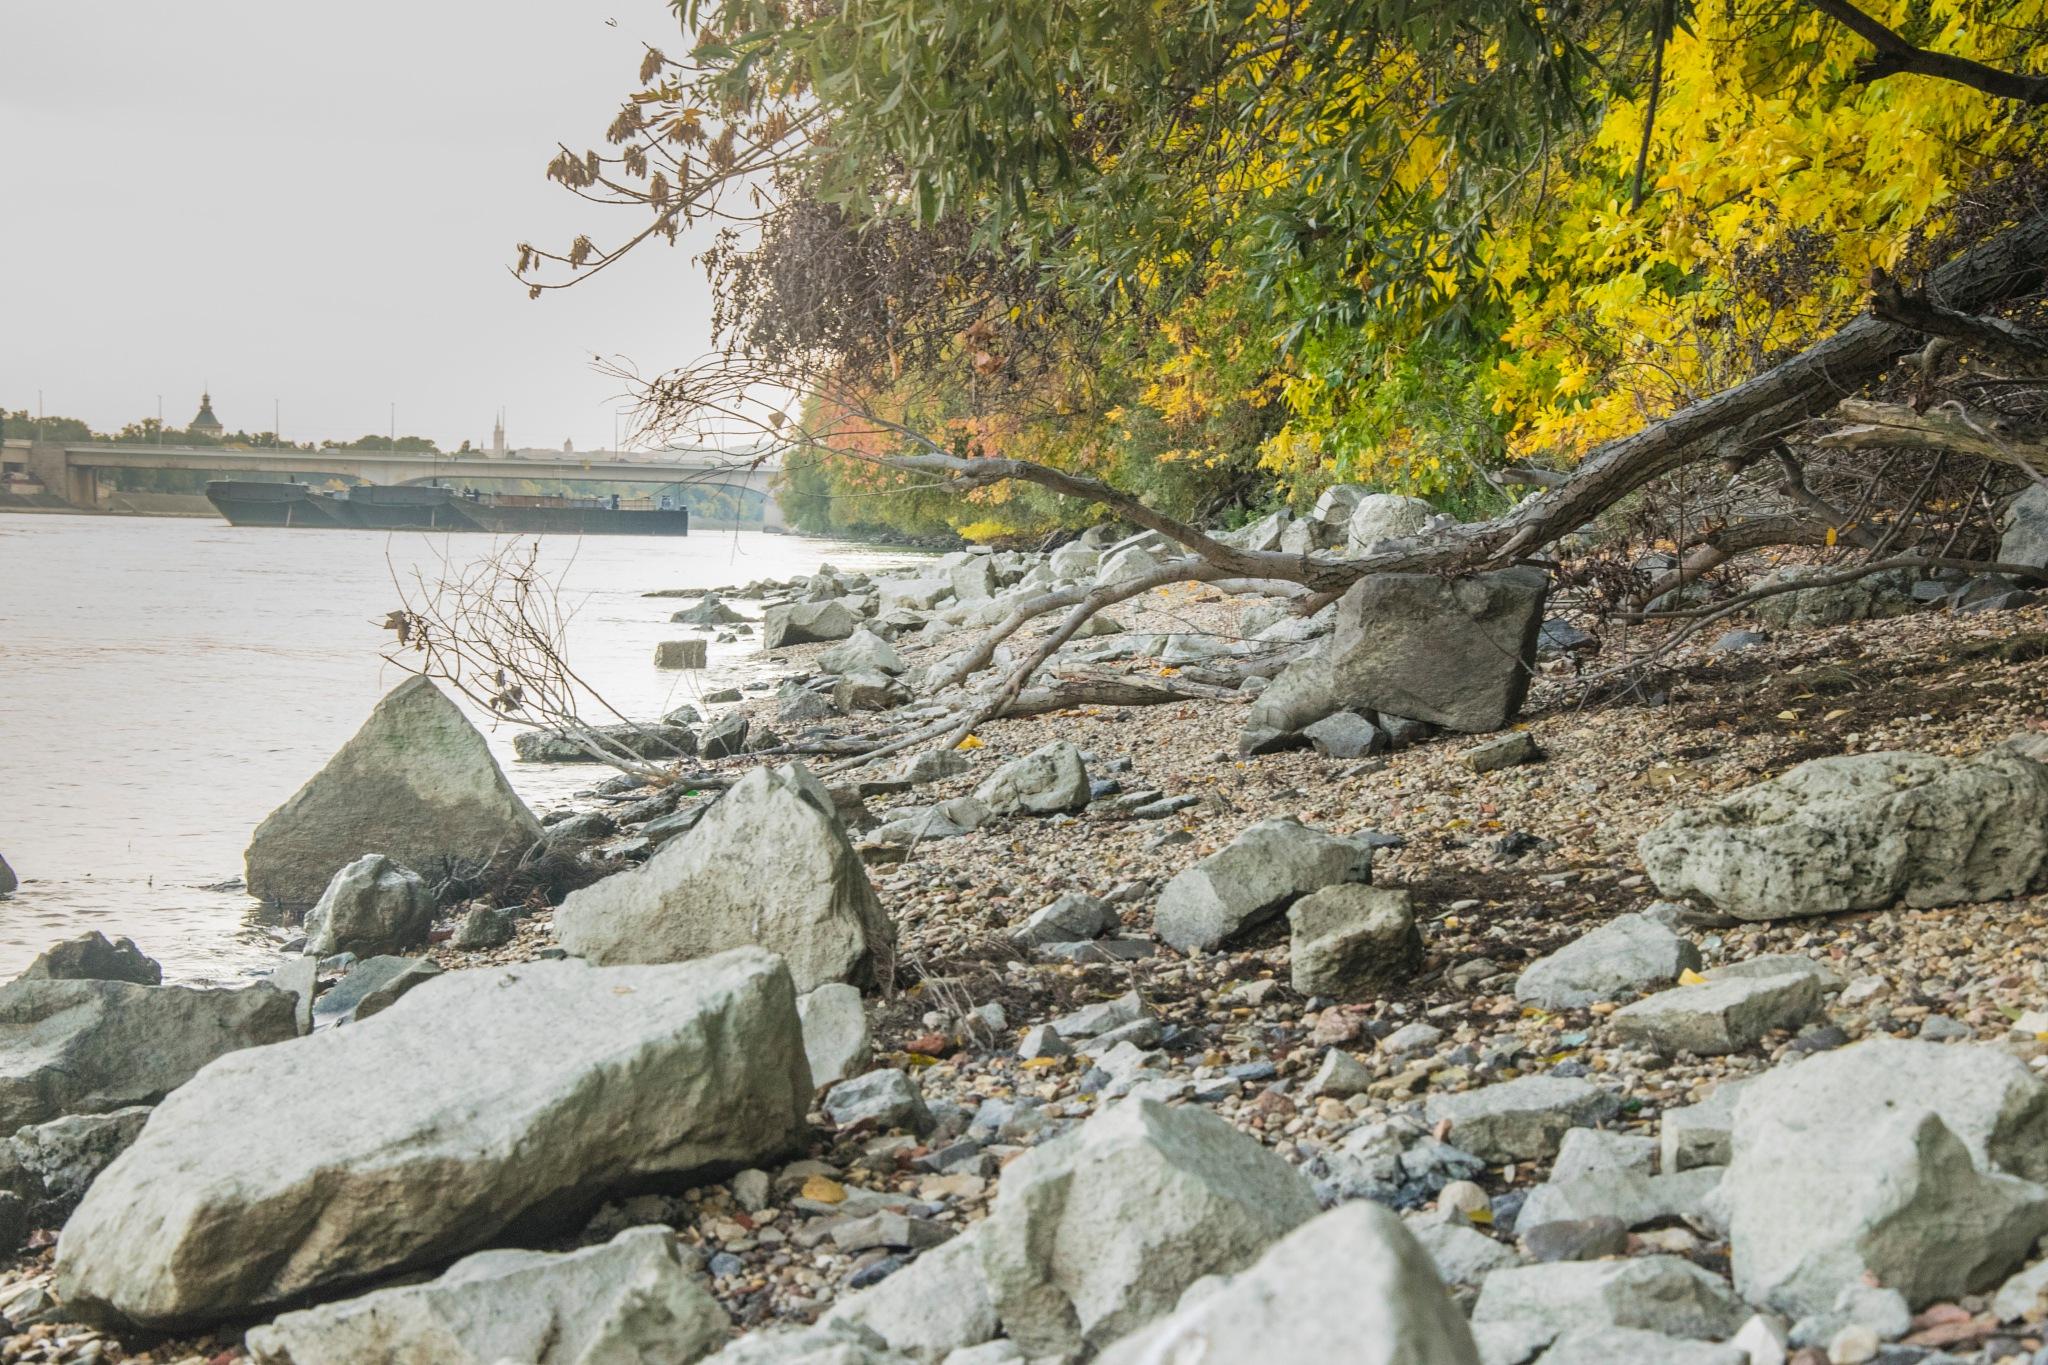 riverside by Péter Hóbor